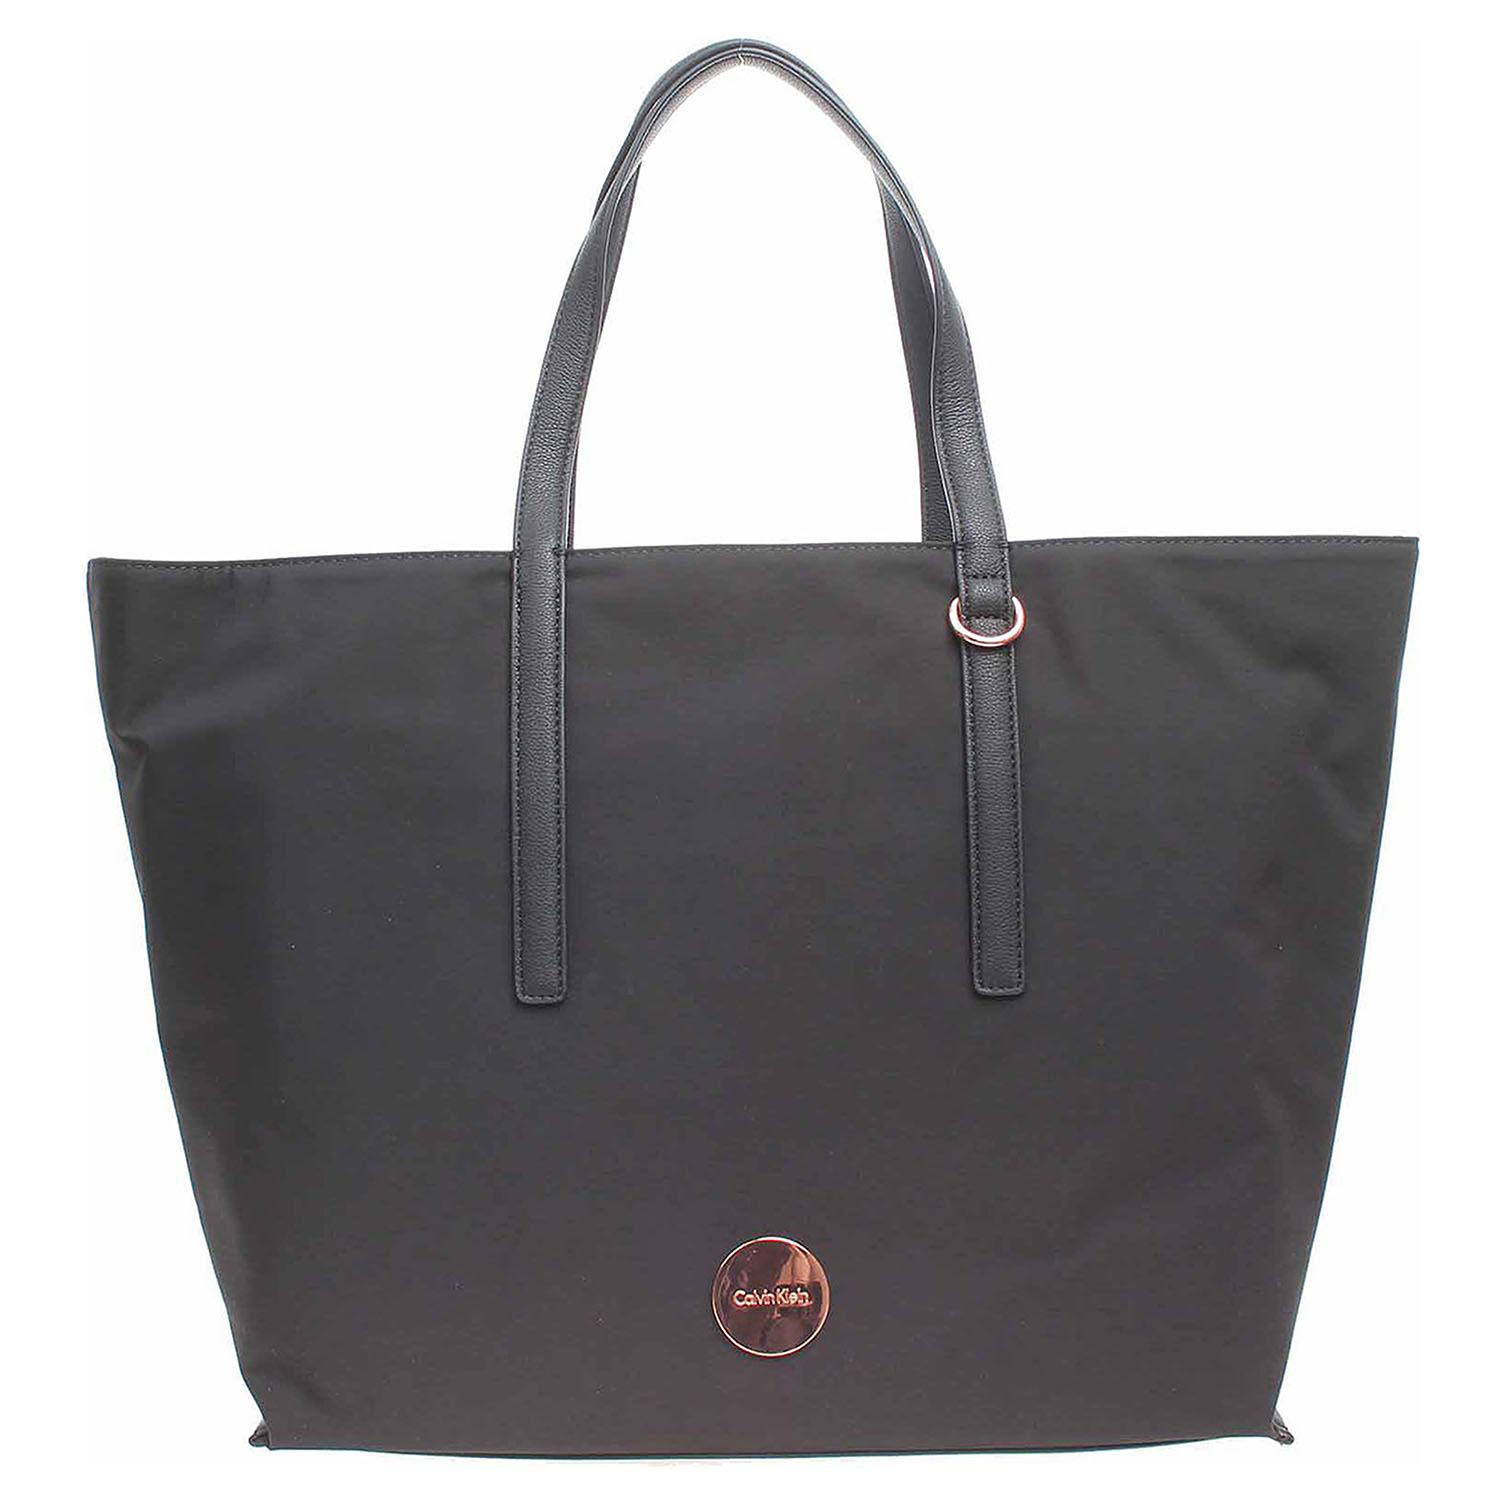 Calvin Klein dámská kabelka K60K602635001 černá 1